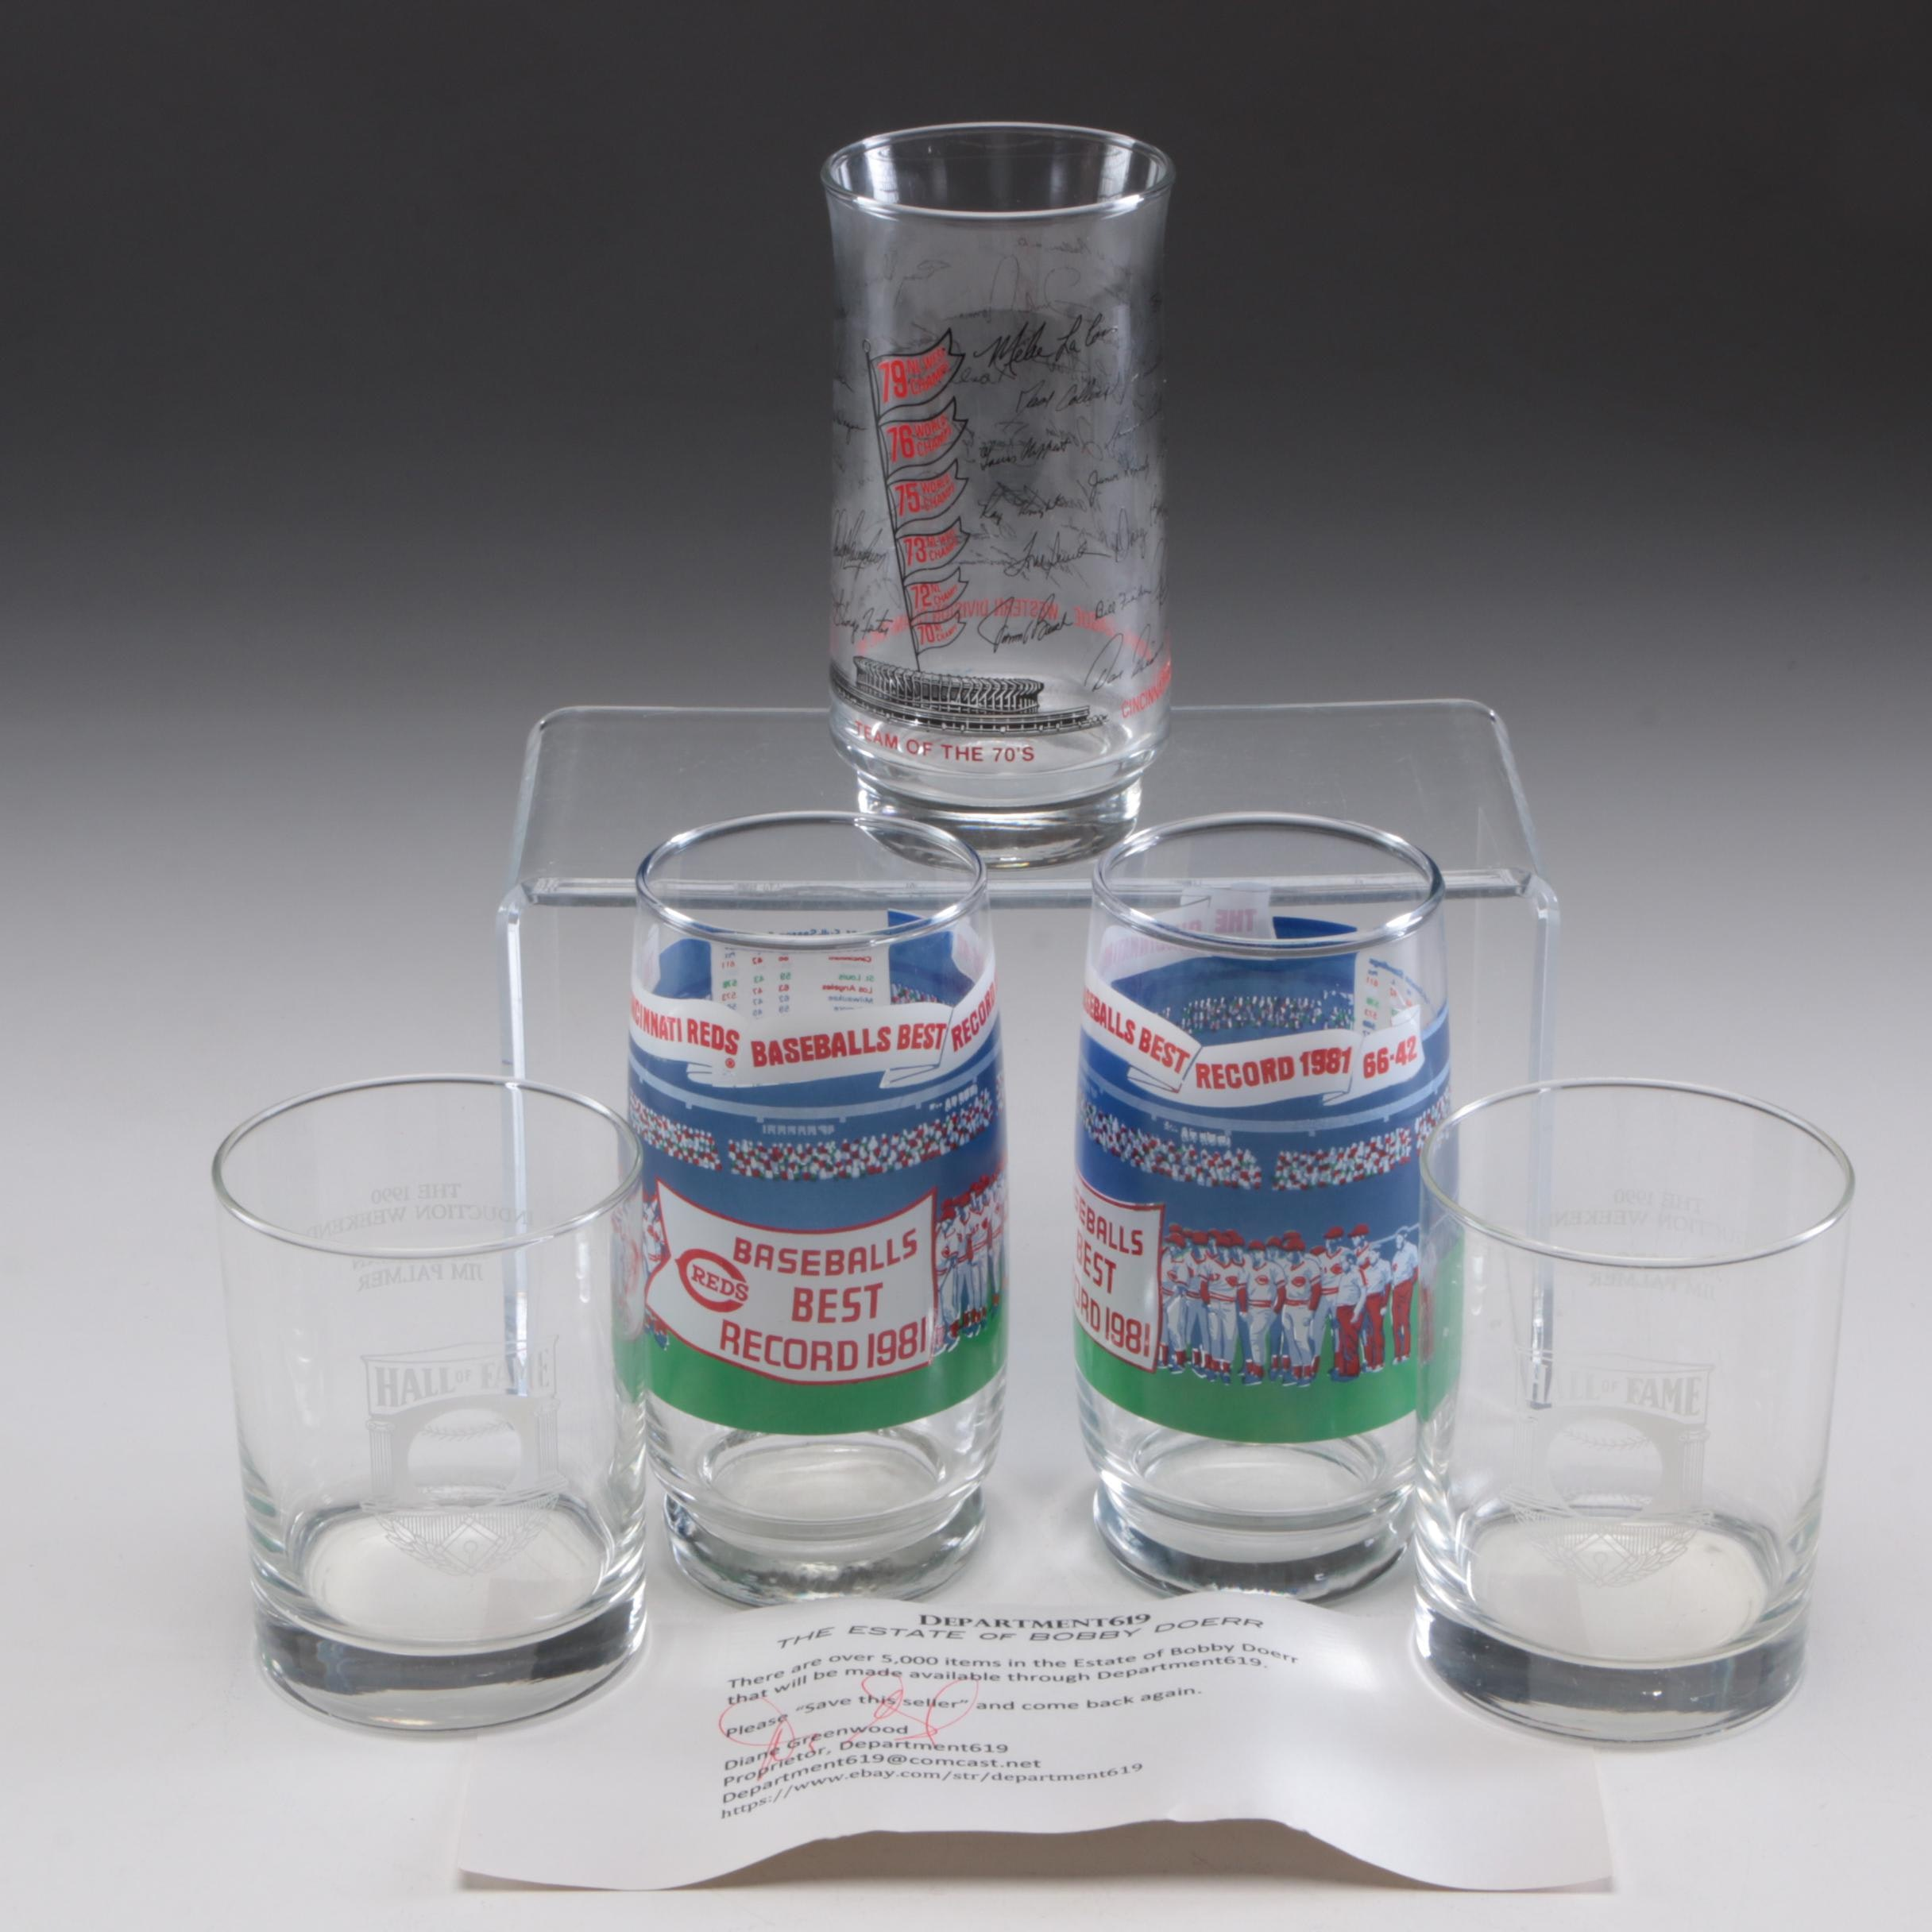 Baseball Glasses, From the Marge Schott and Bobby Doerr Estates